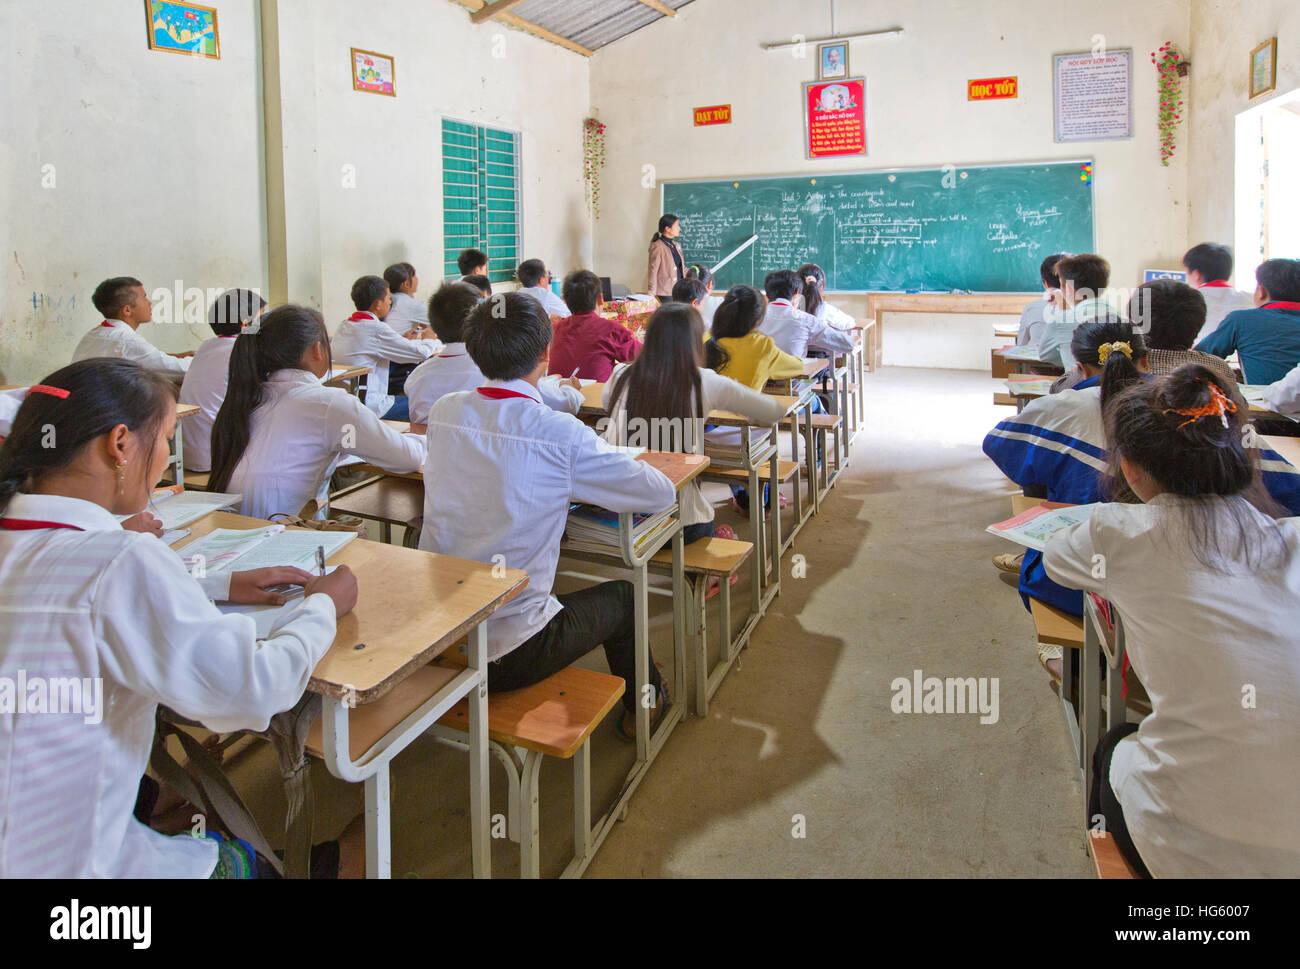 Students attending class, teacher instructing English lesson. Stock Photo